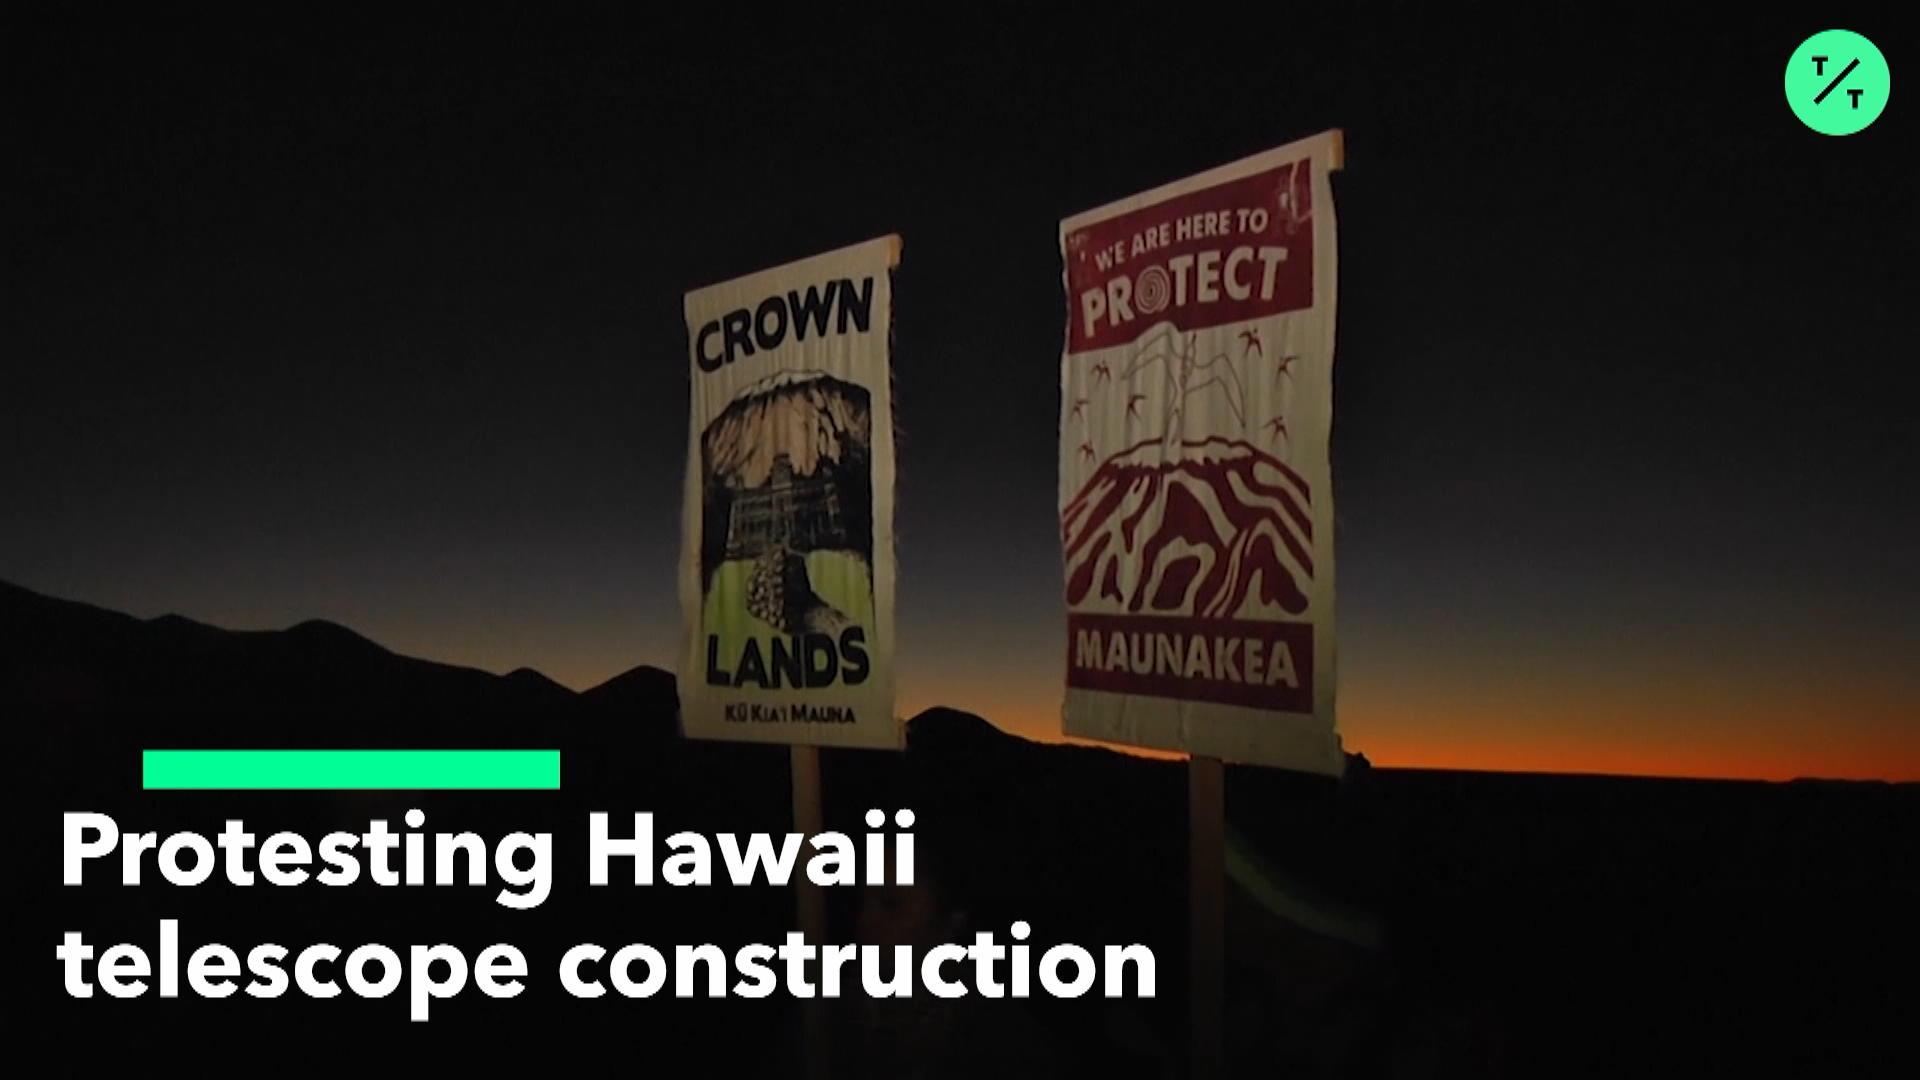 Protesting Hawaii Telescope Construction